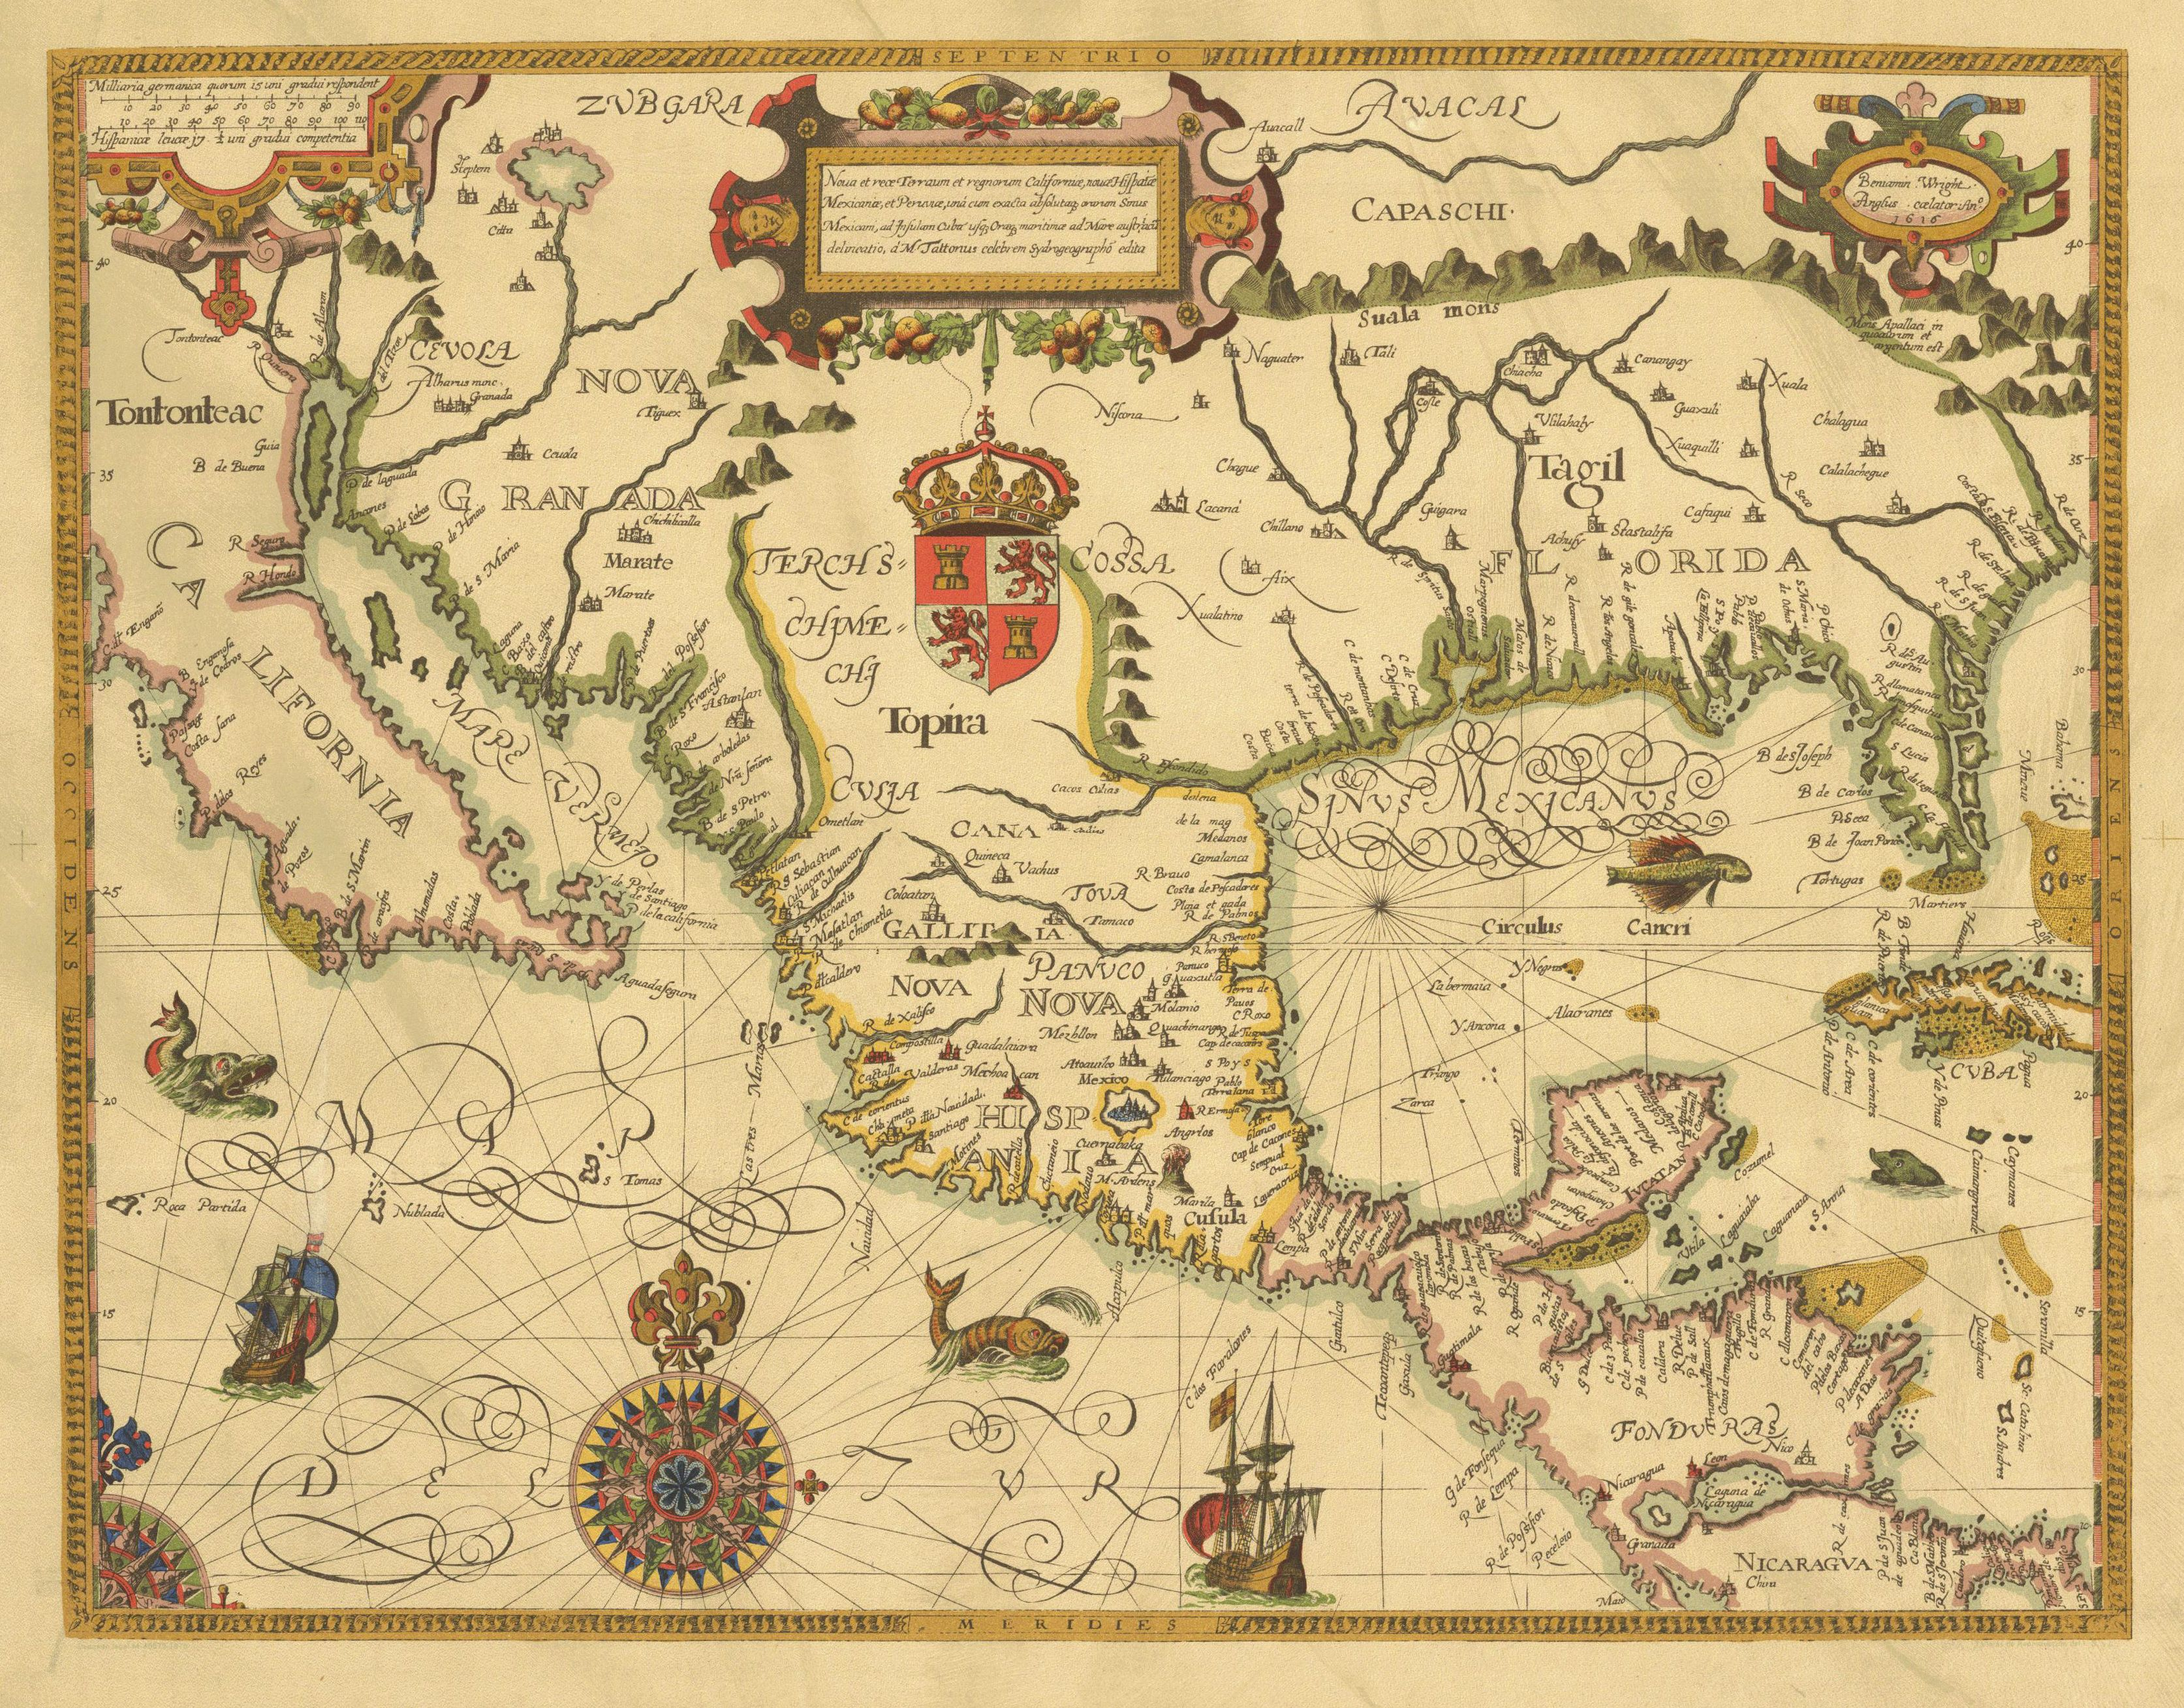 México 1616 Nova Et Rece Teraum Et Regnorum California Http 132 248 9 32 Ipgh Ipgh Mh V1 21 25 Pdf Cartography Old Maps Vintage World Maps